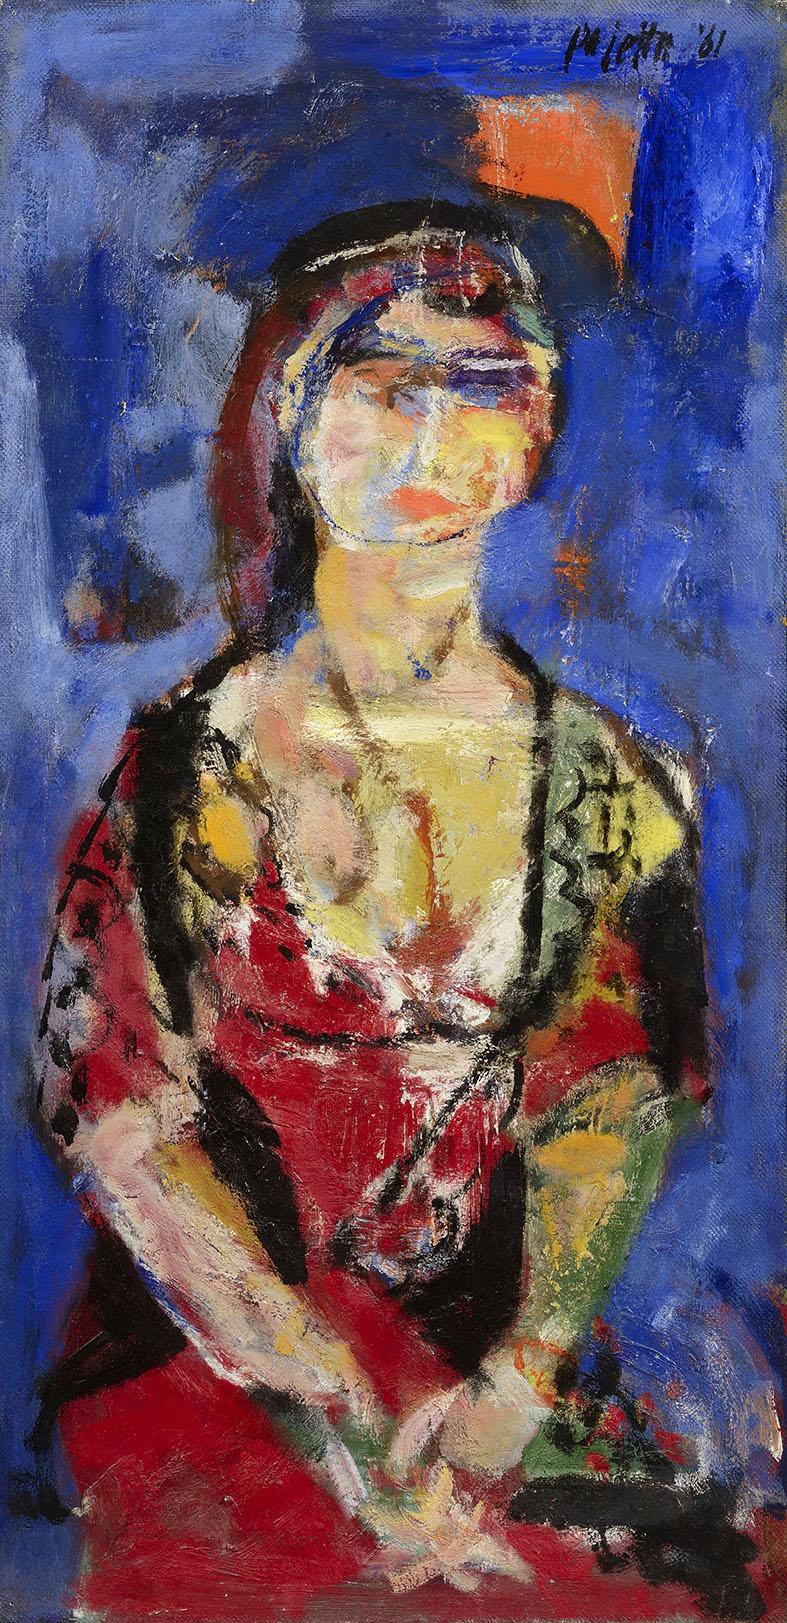 Donna rosso nera, 1961 olio su tela, 90 x 45 cm